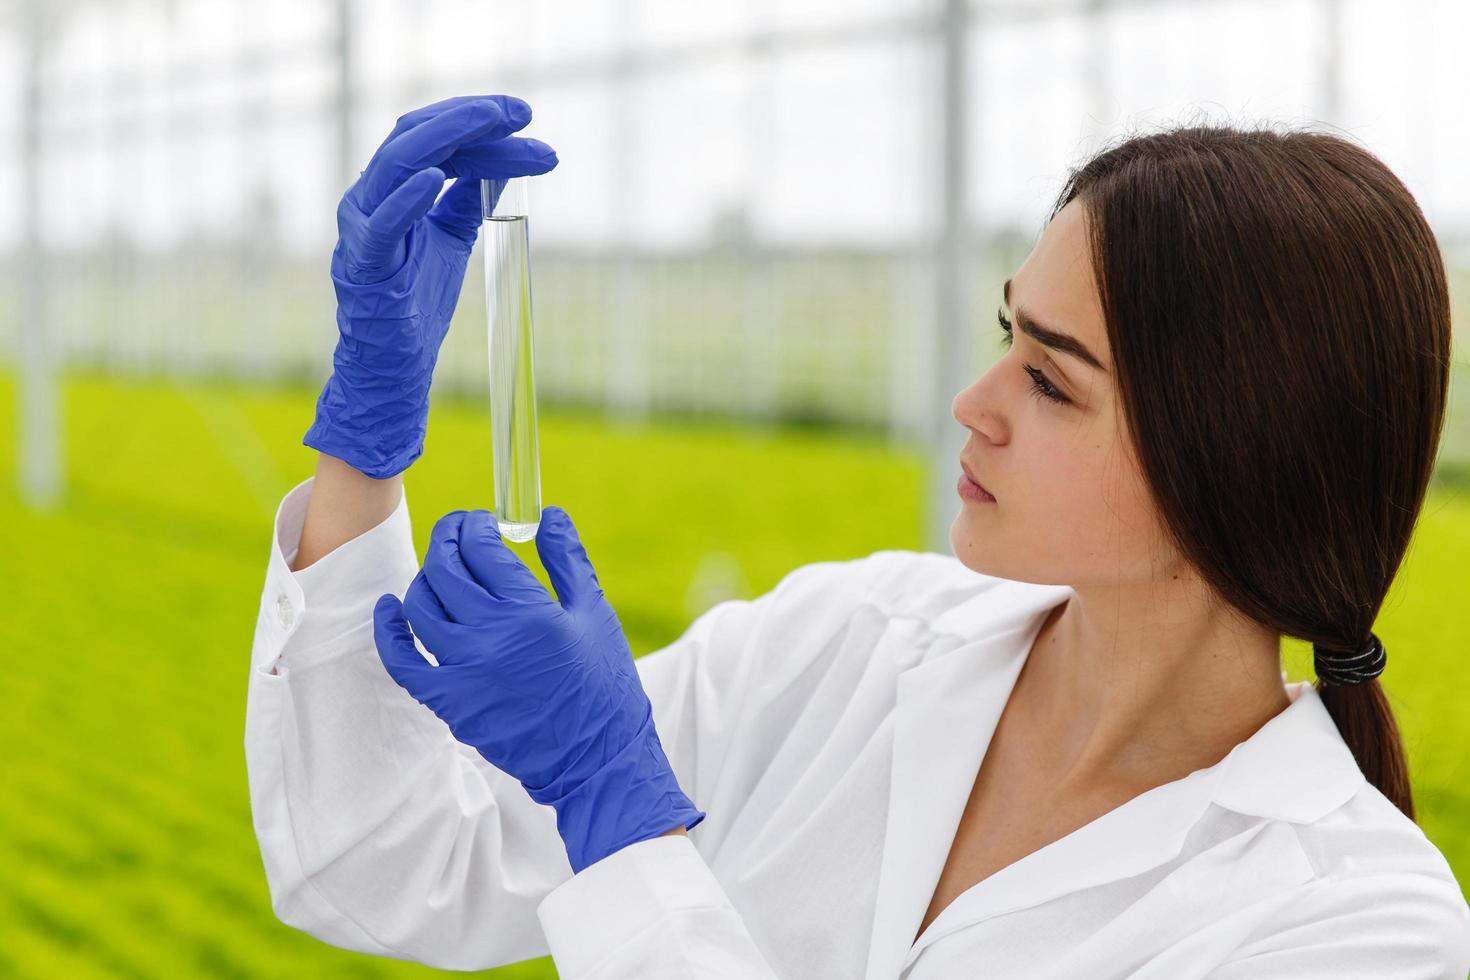 investigadora sostiene un tubo de vidrio foto